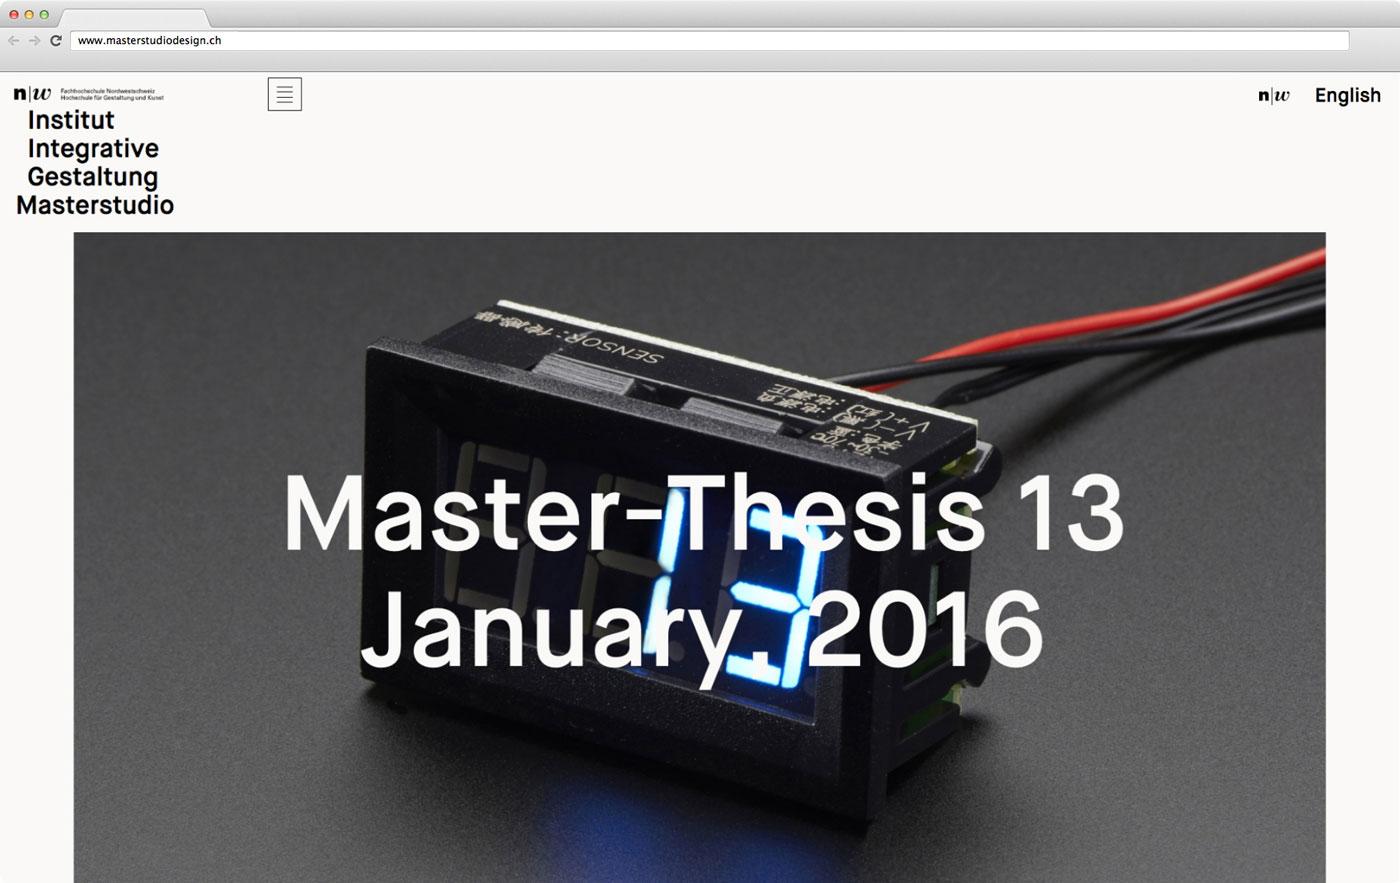 Masterstudio Webseite 01